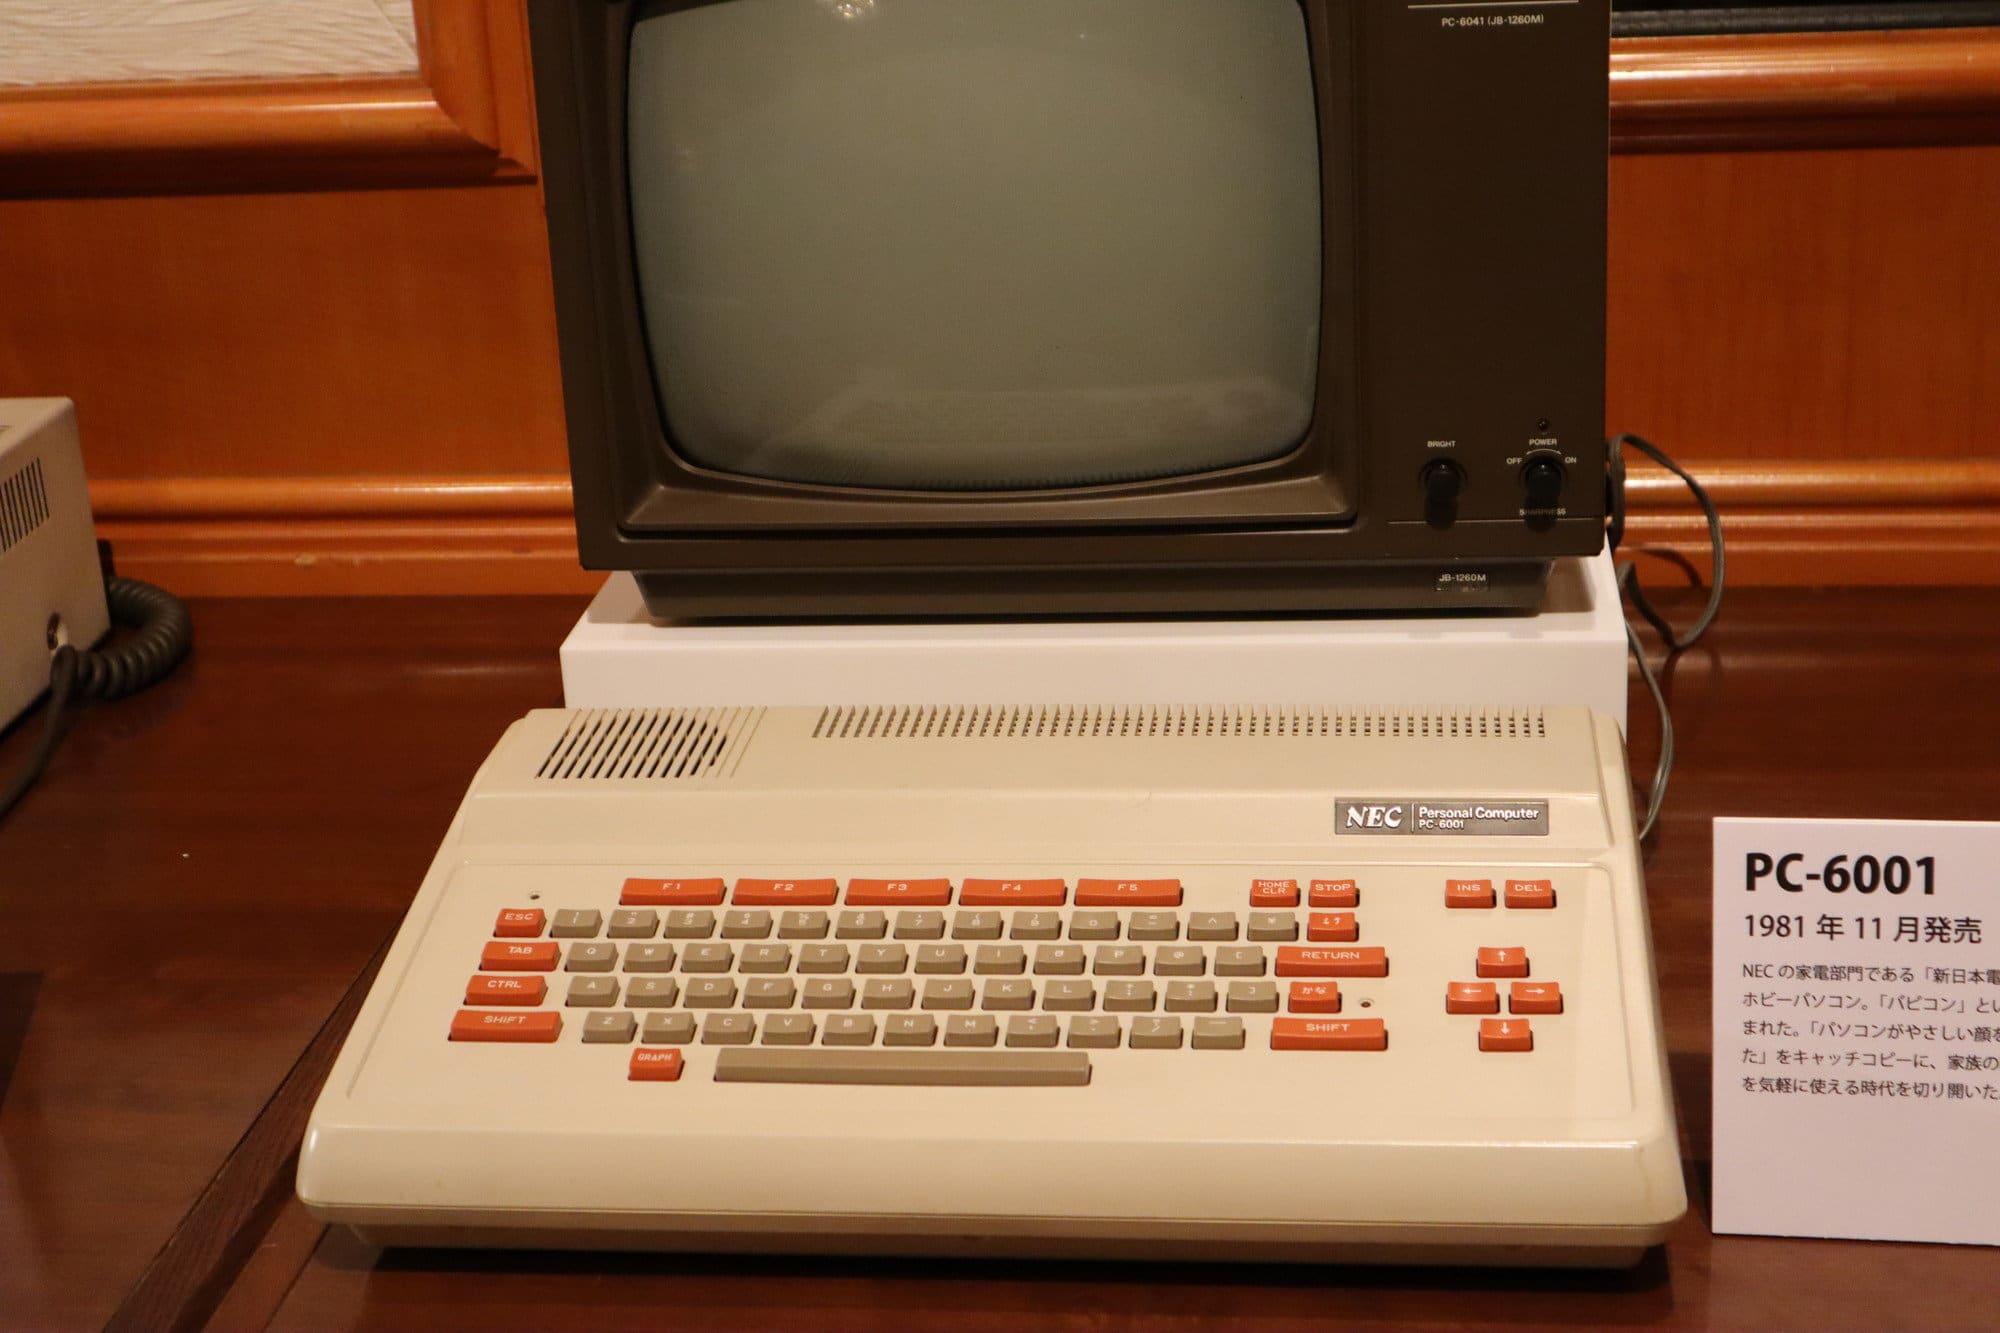 PC-6001